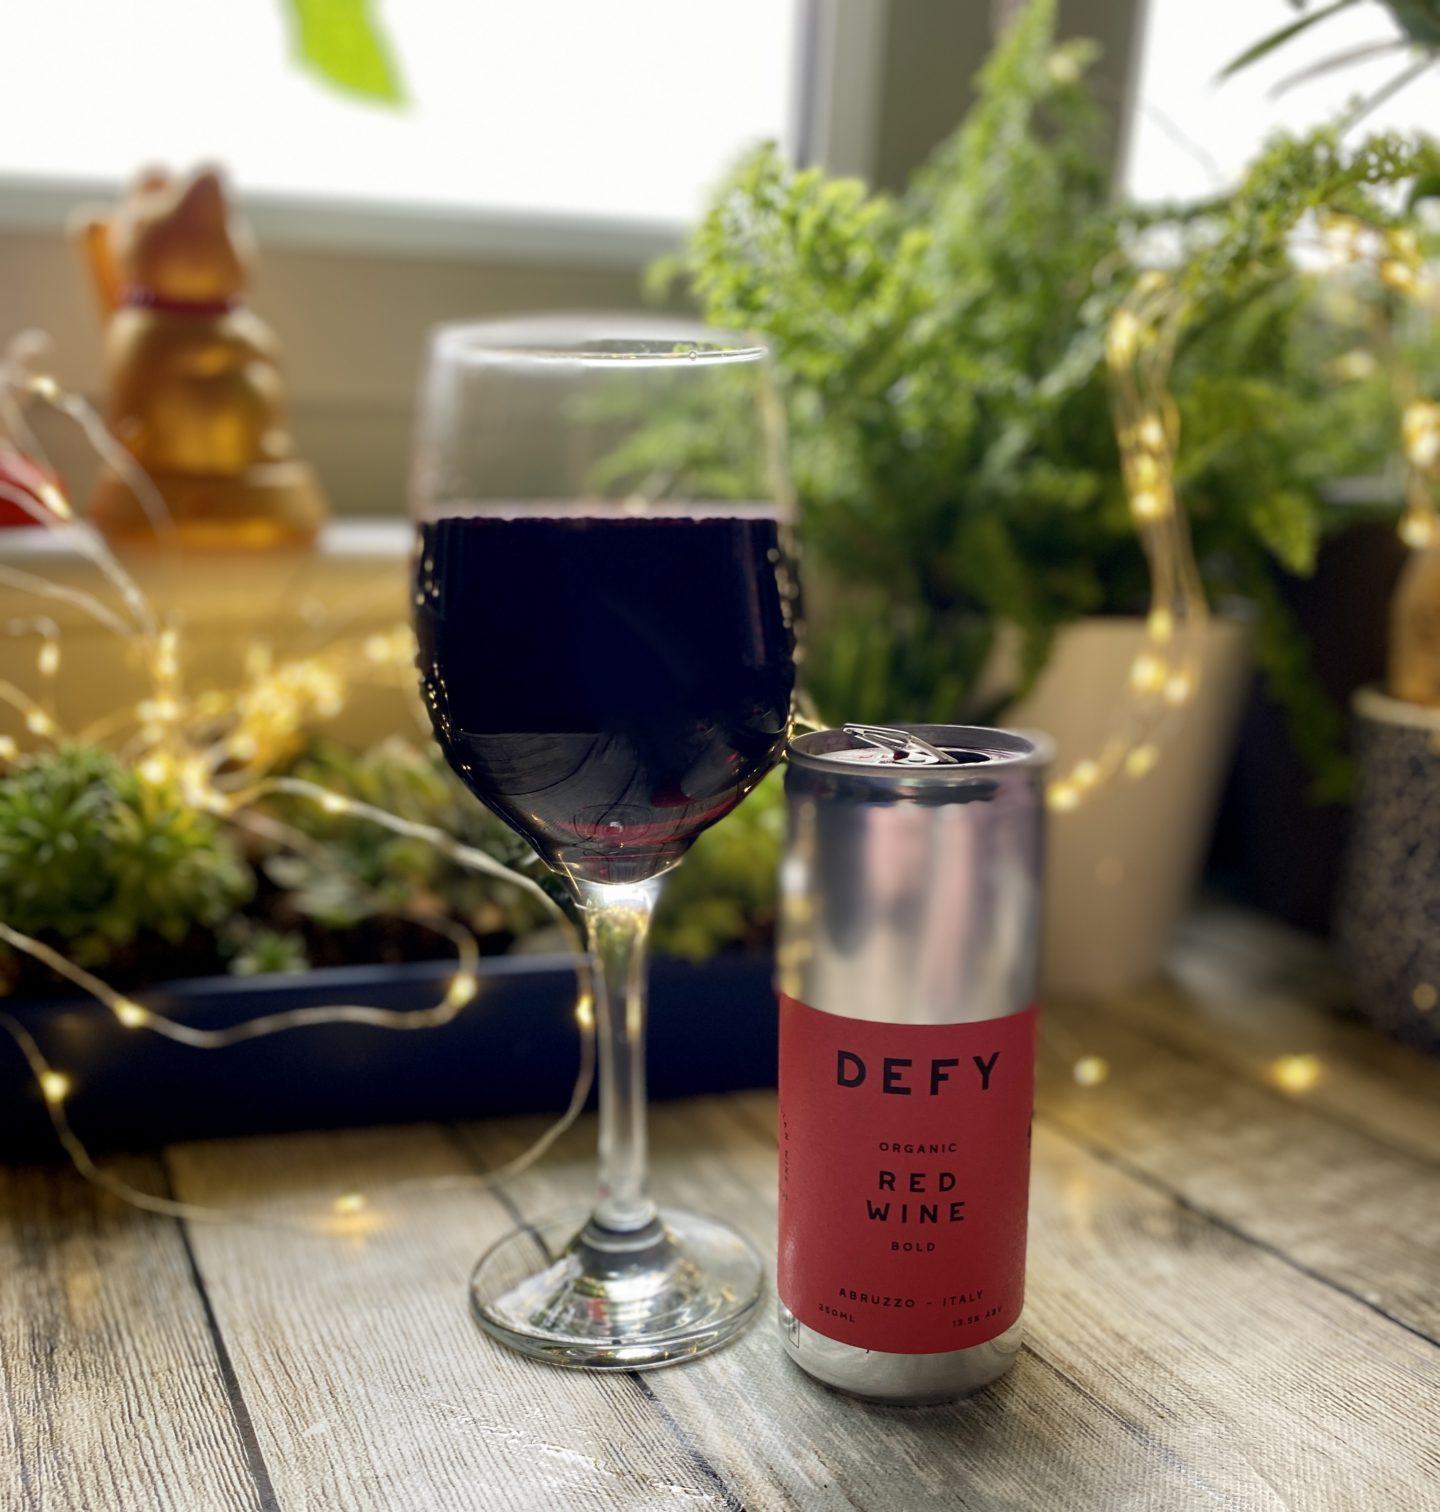 Defy organic wine Can